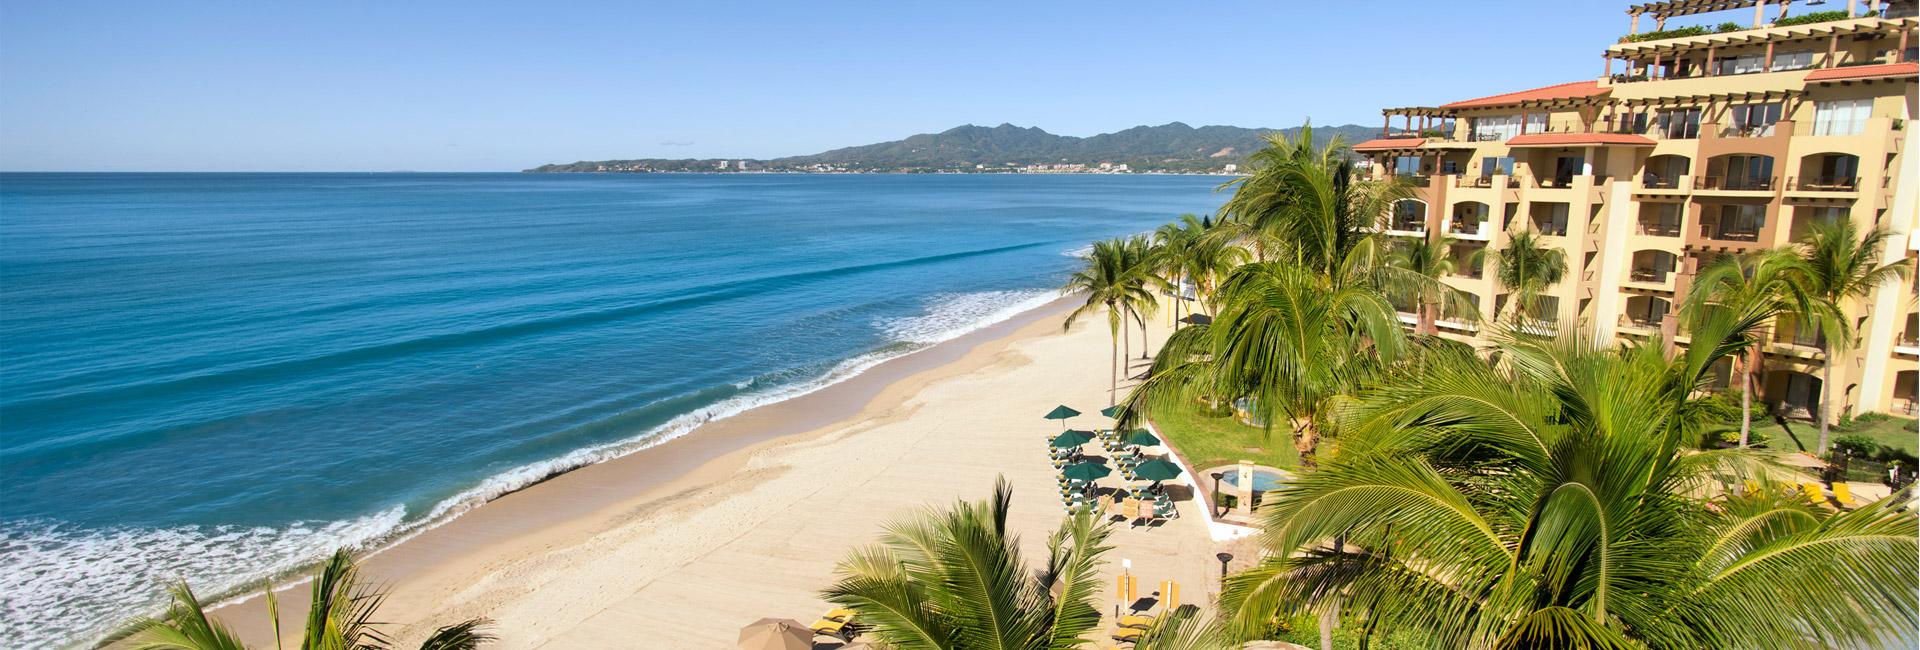 Villa La Estancia Rn Beach